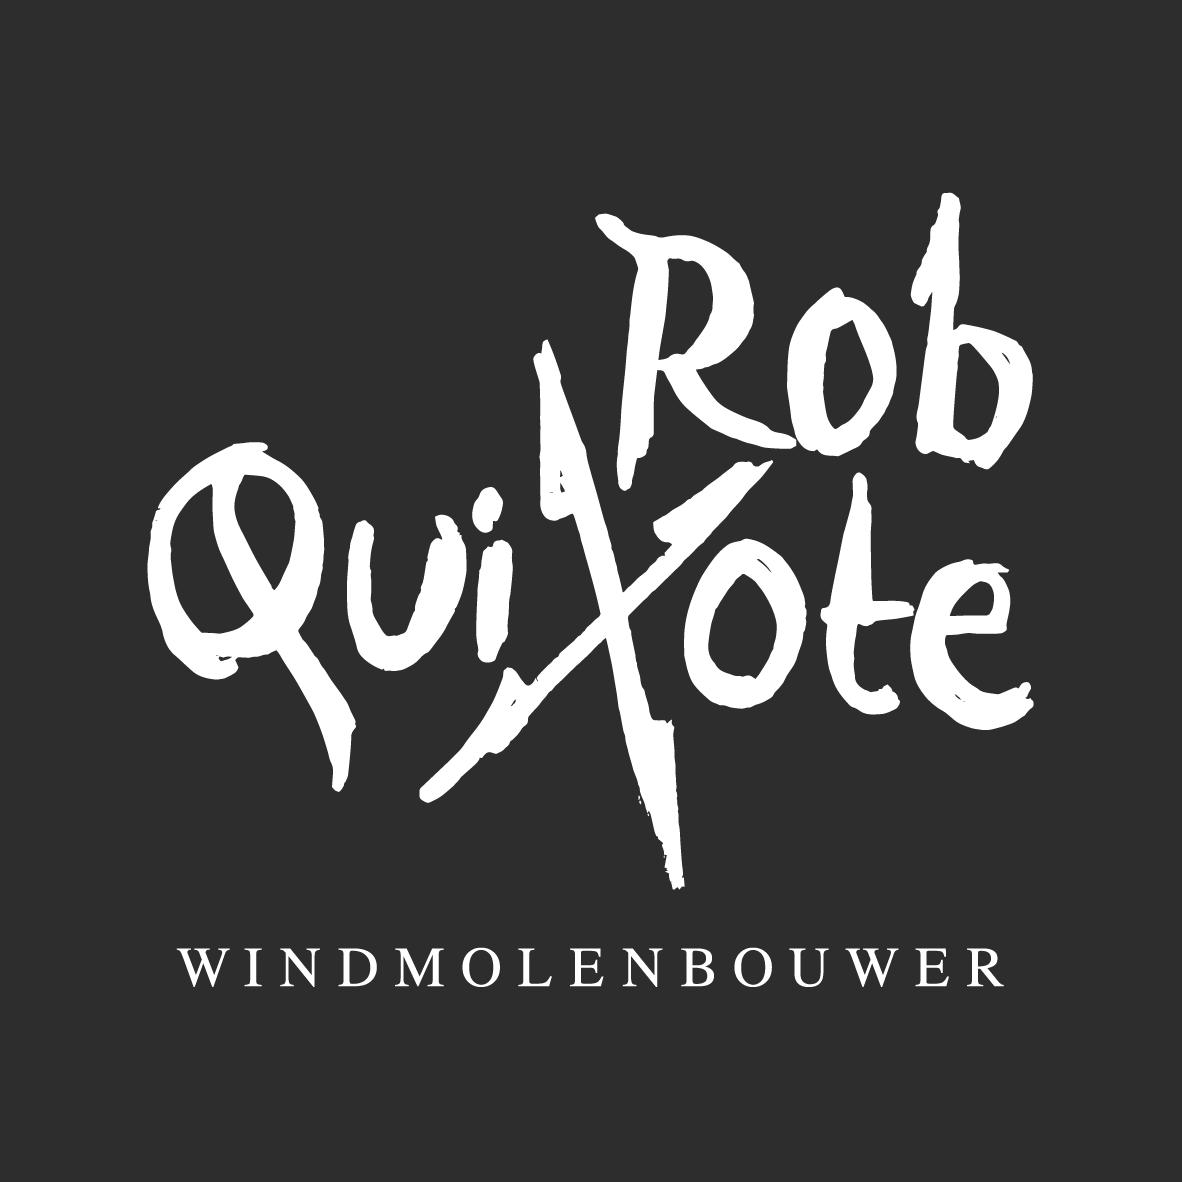 Rob Quixote